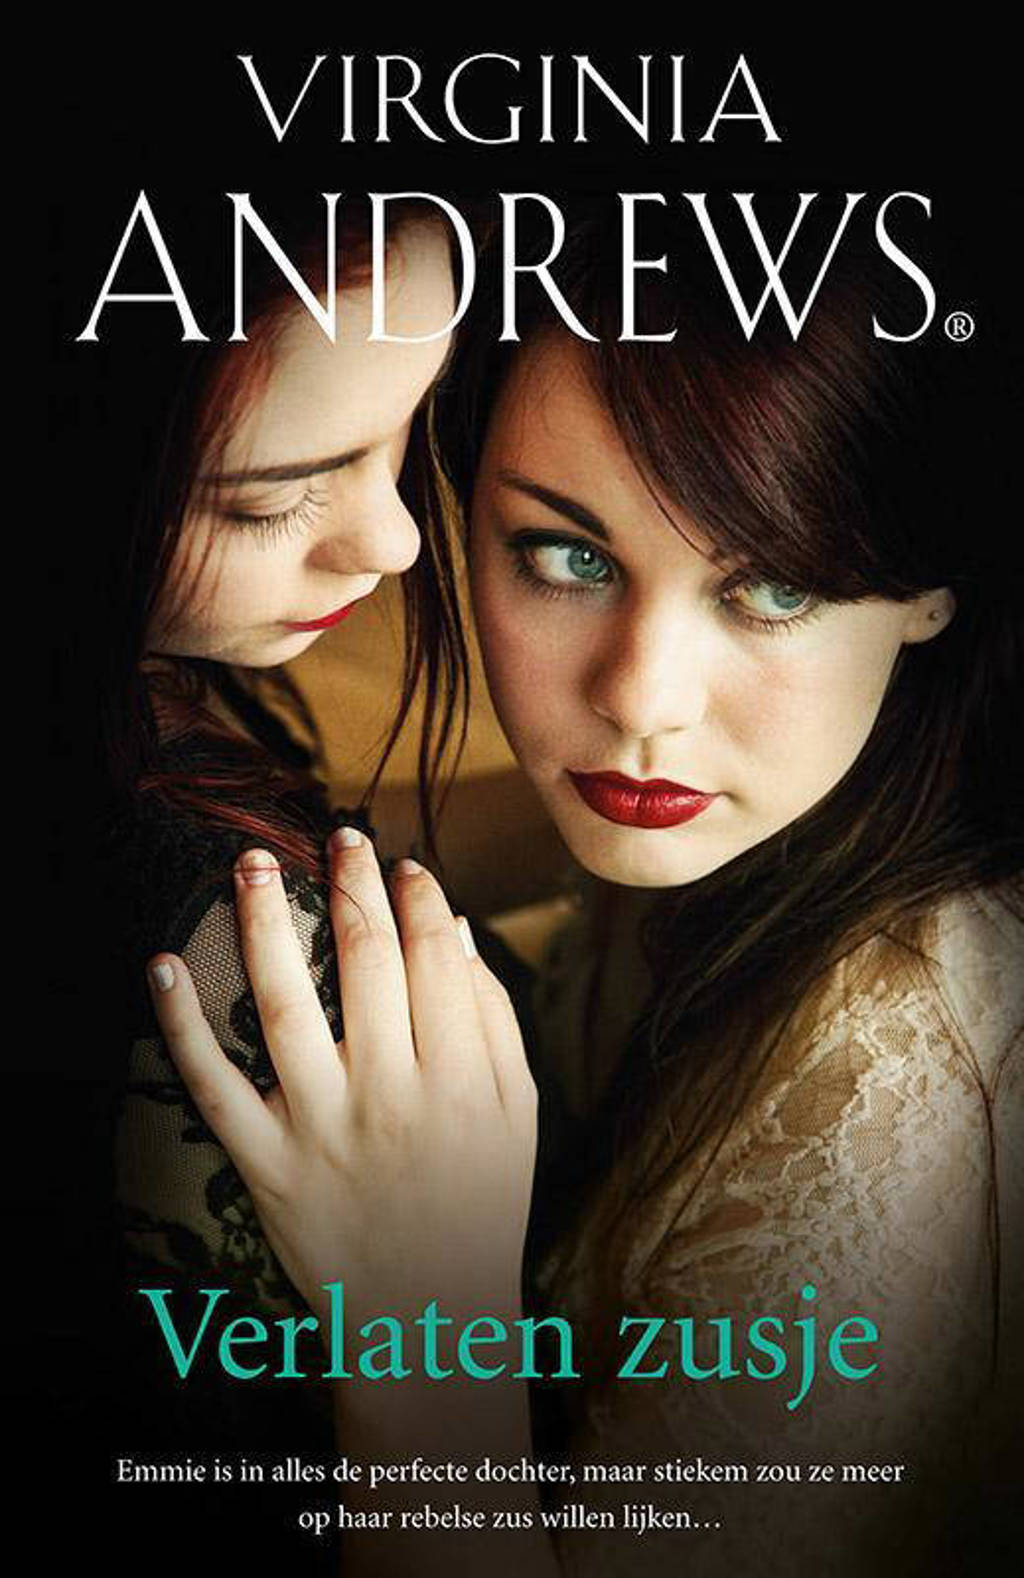 Roxy-serie: Verlaten zusje - Virginia Andrews